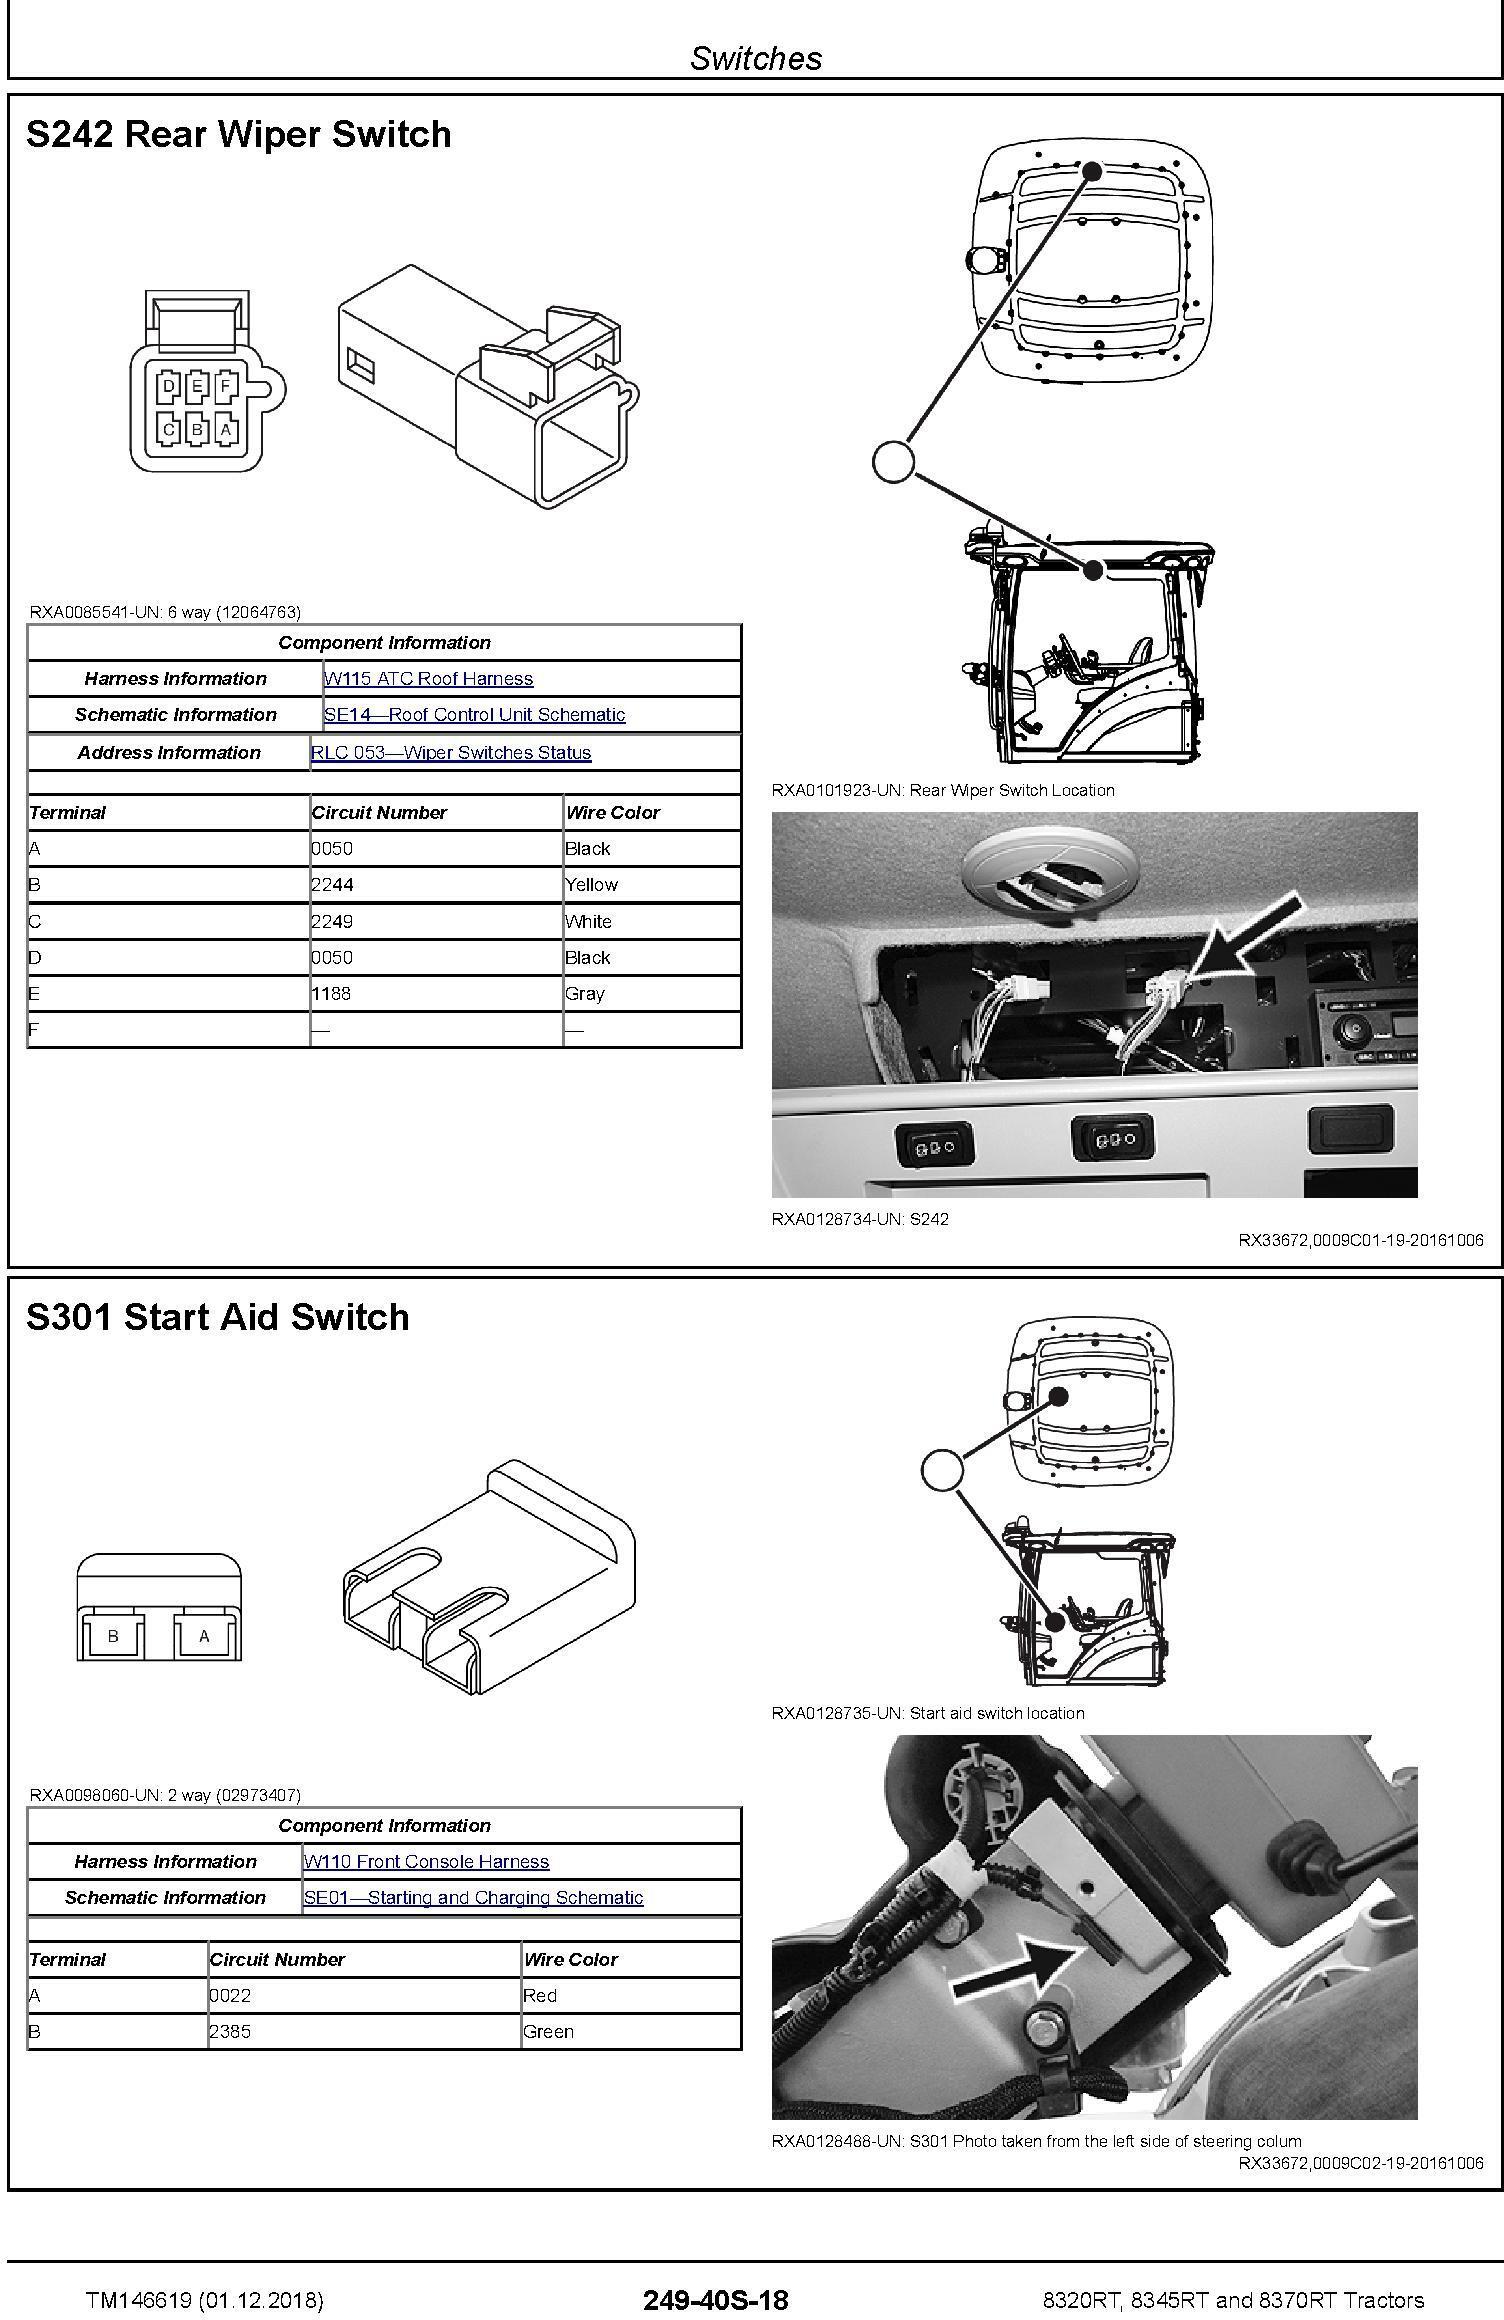 John Deere 8320RT, 8345RT, 8370RT Tractors (SN.917000-920000) Diagnostic Technical Manual (TM146619) - 1